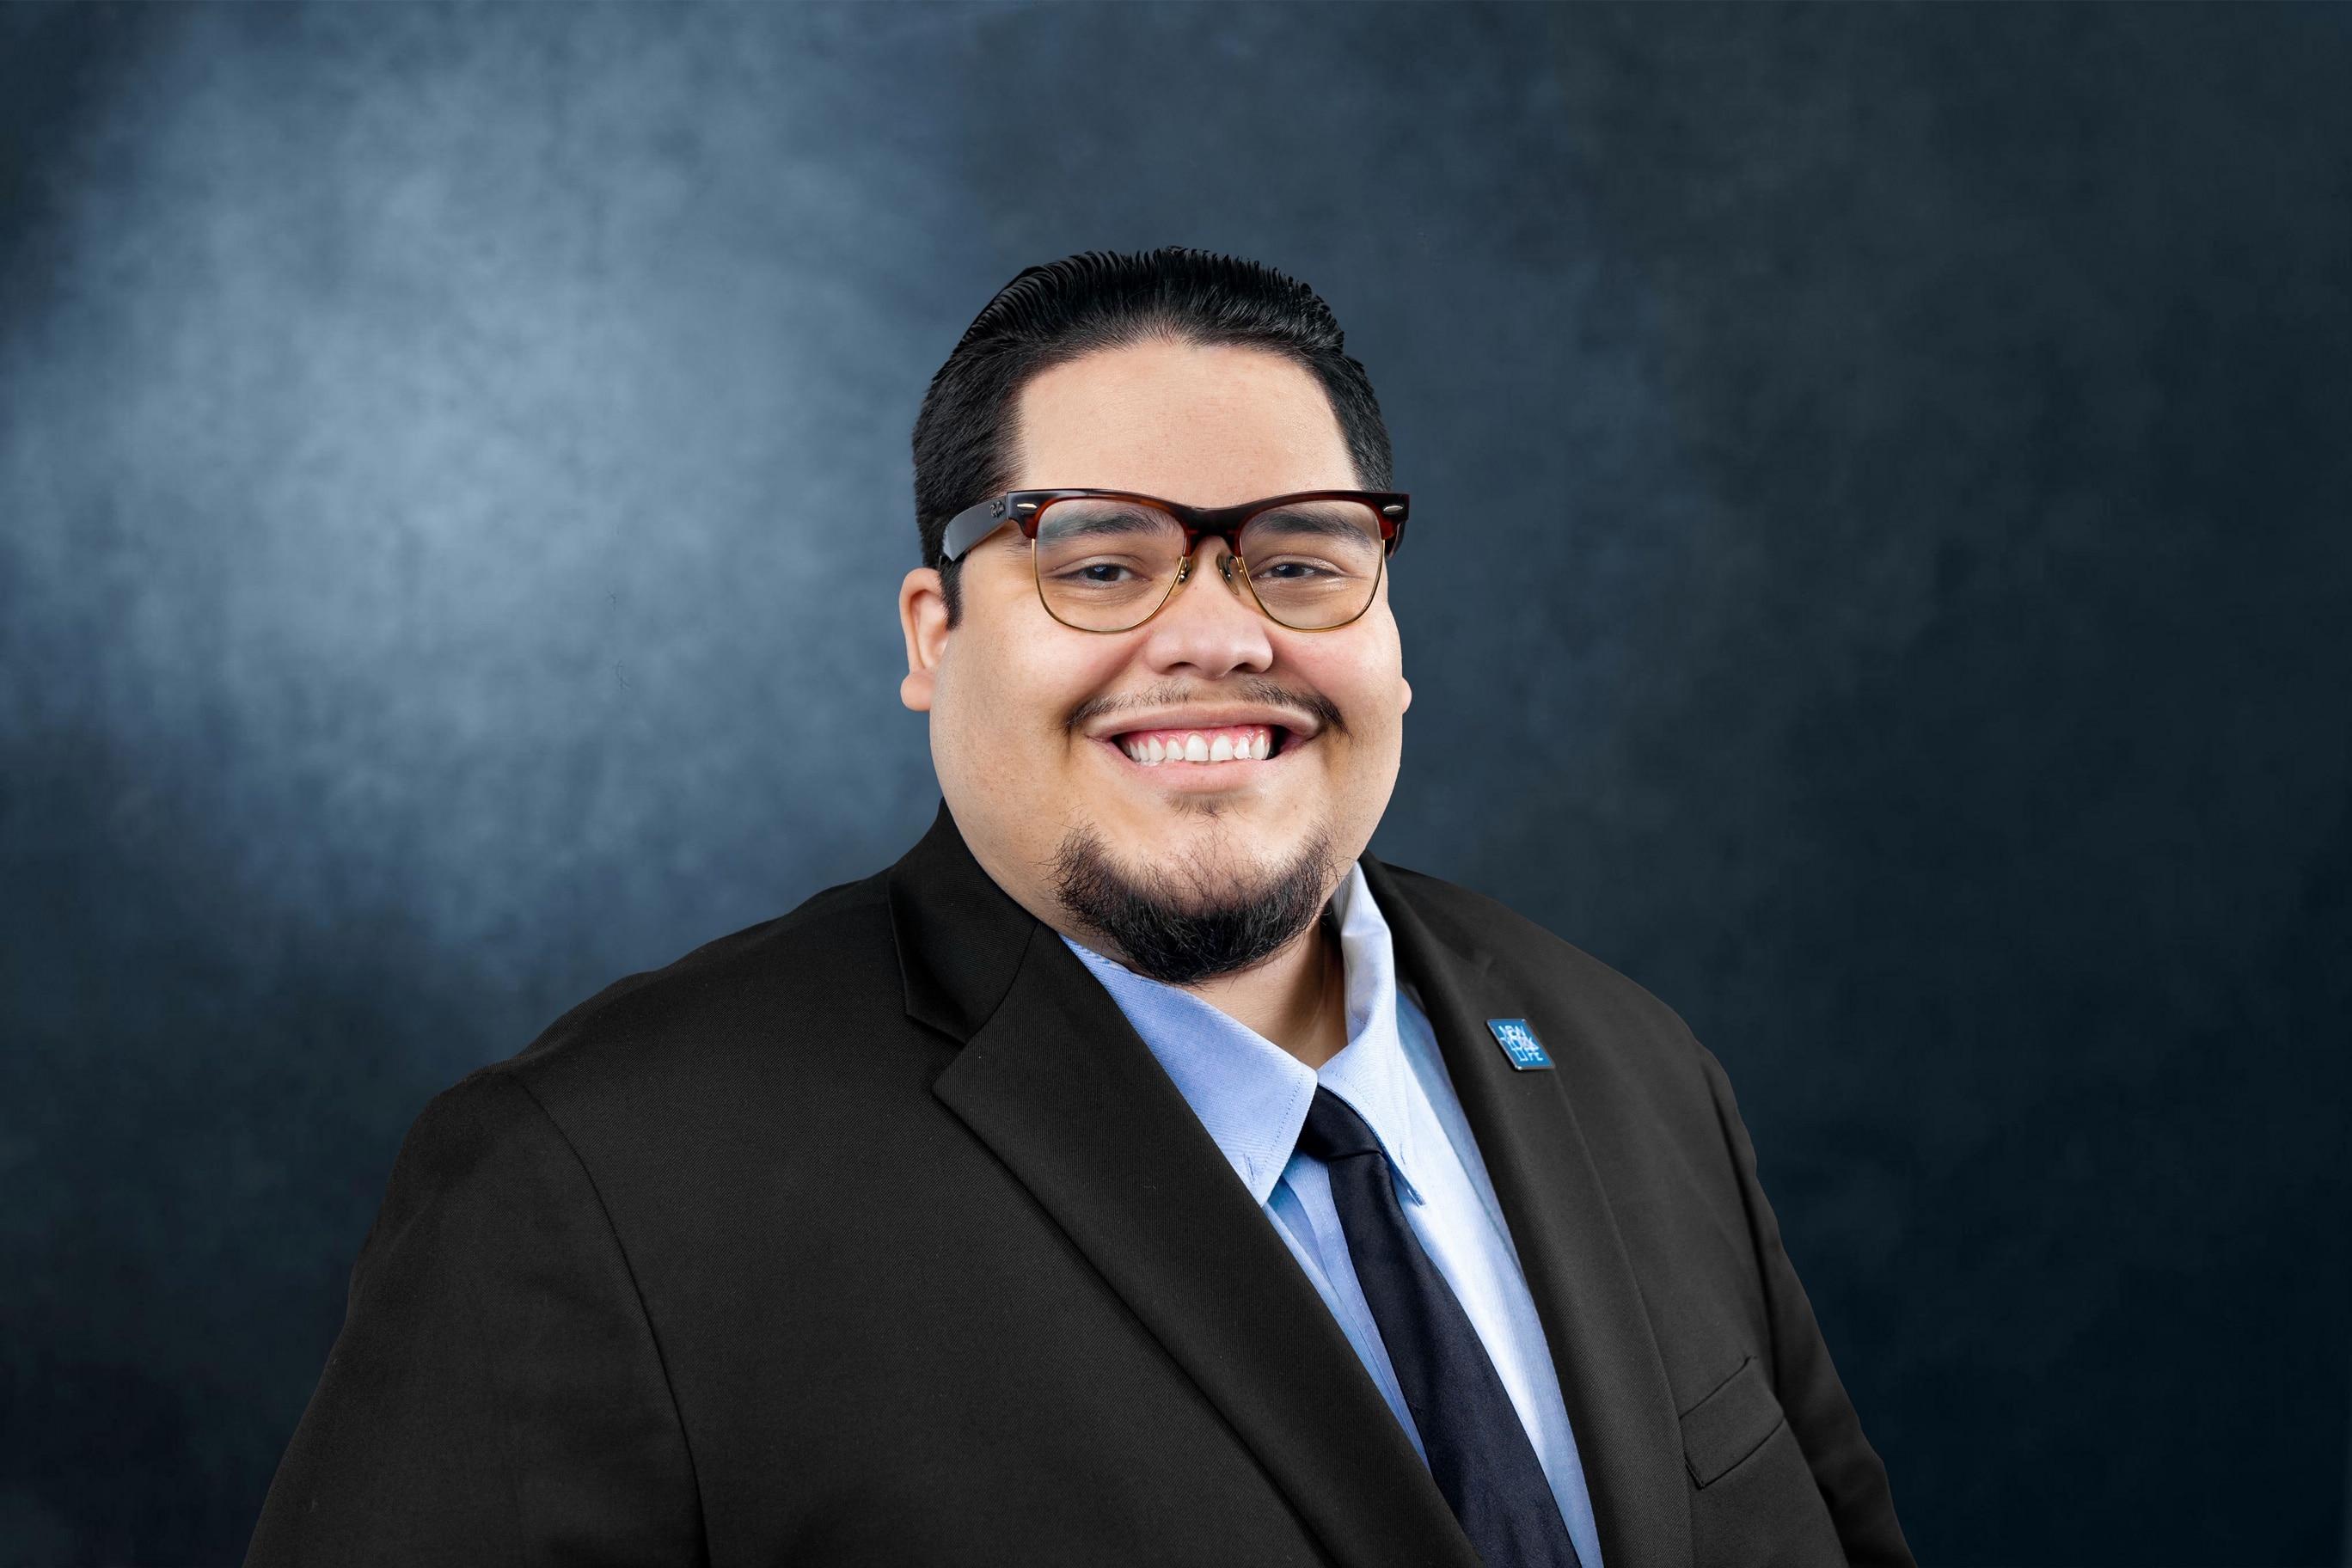 JAIME ALBERTO LOPEZ Financial Professional & Insurance Agent